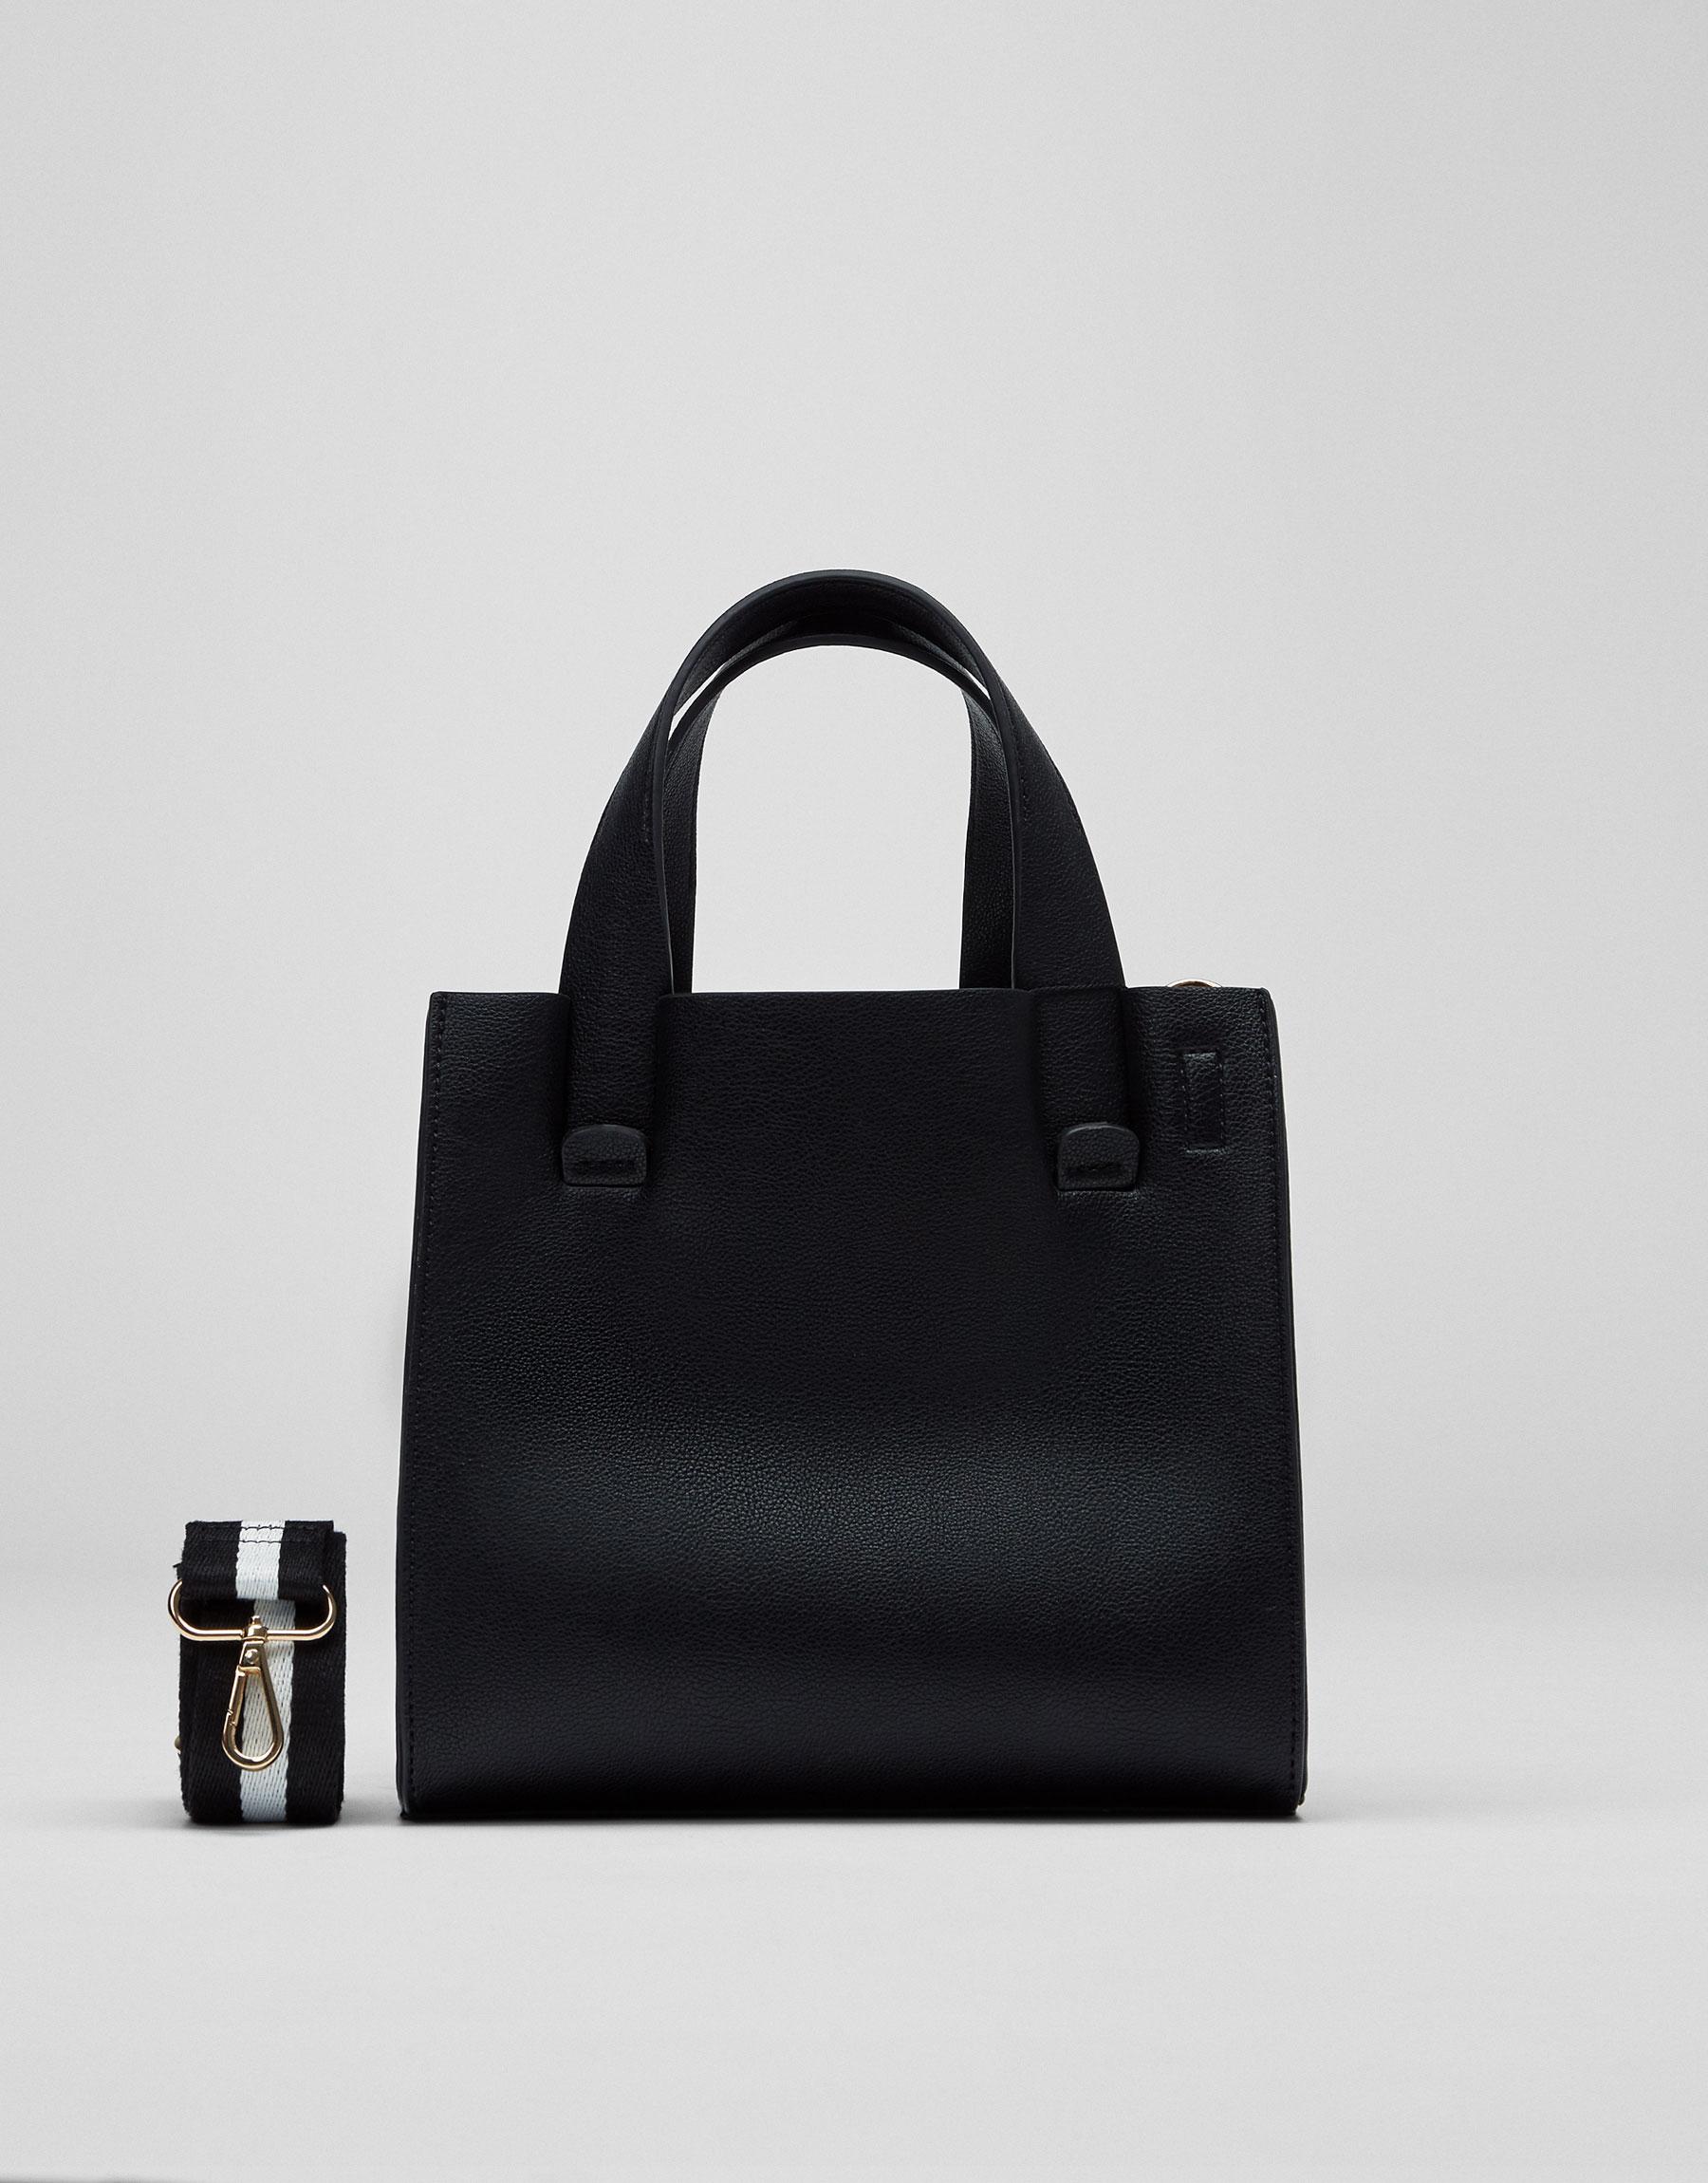 Basic black tote